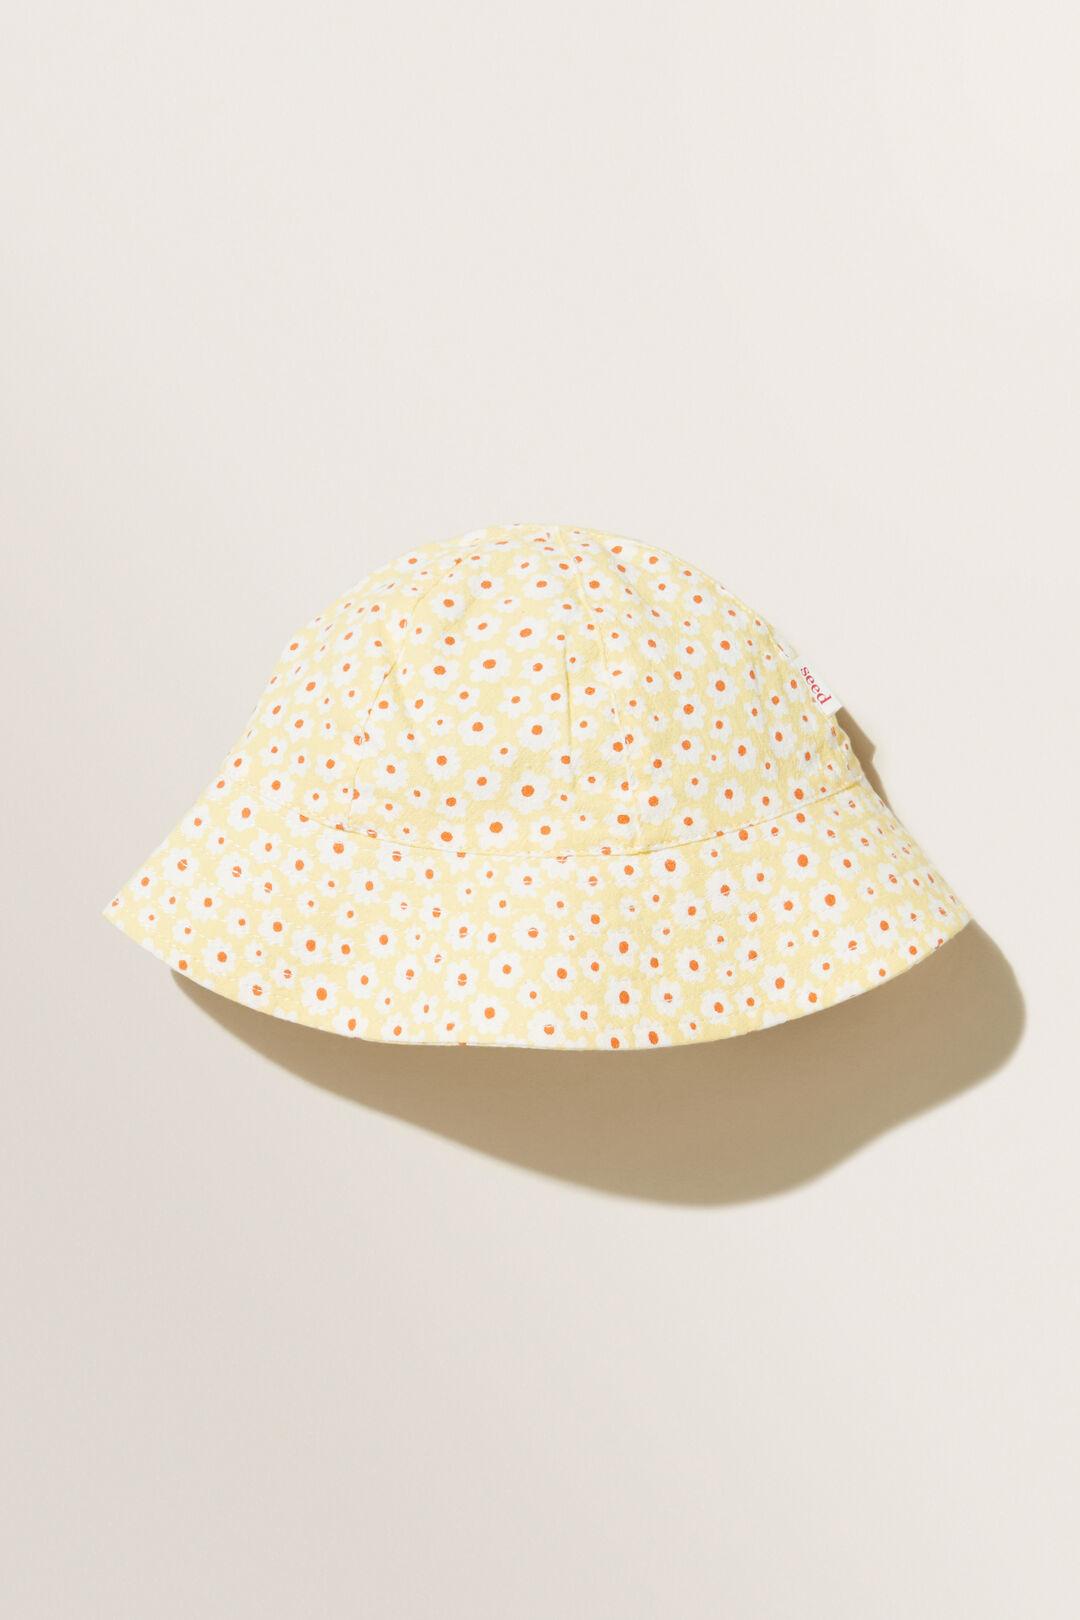 Floral Sun Hat  Multi  hi-res